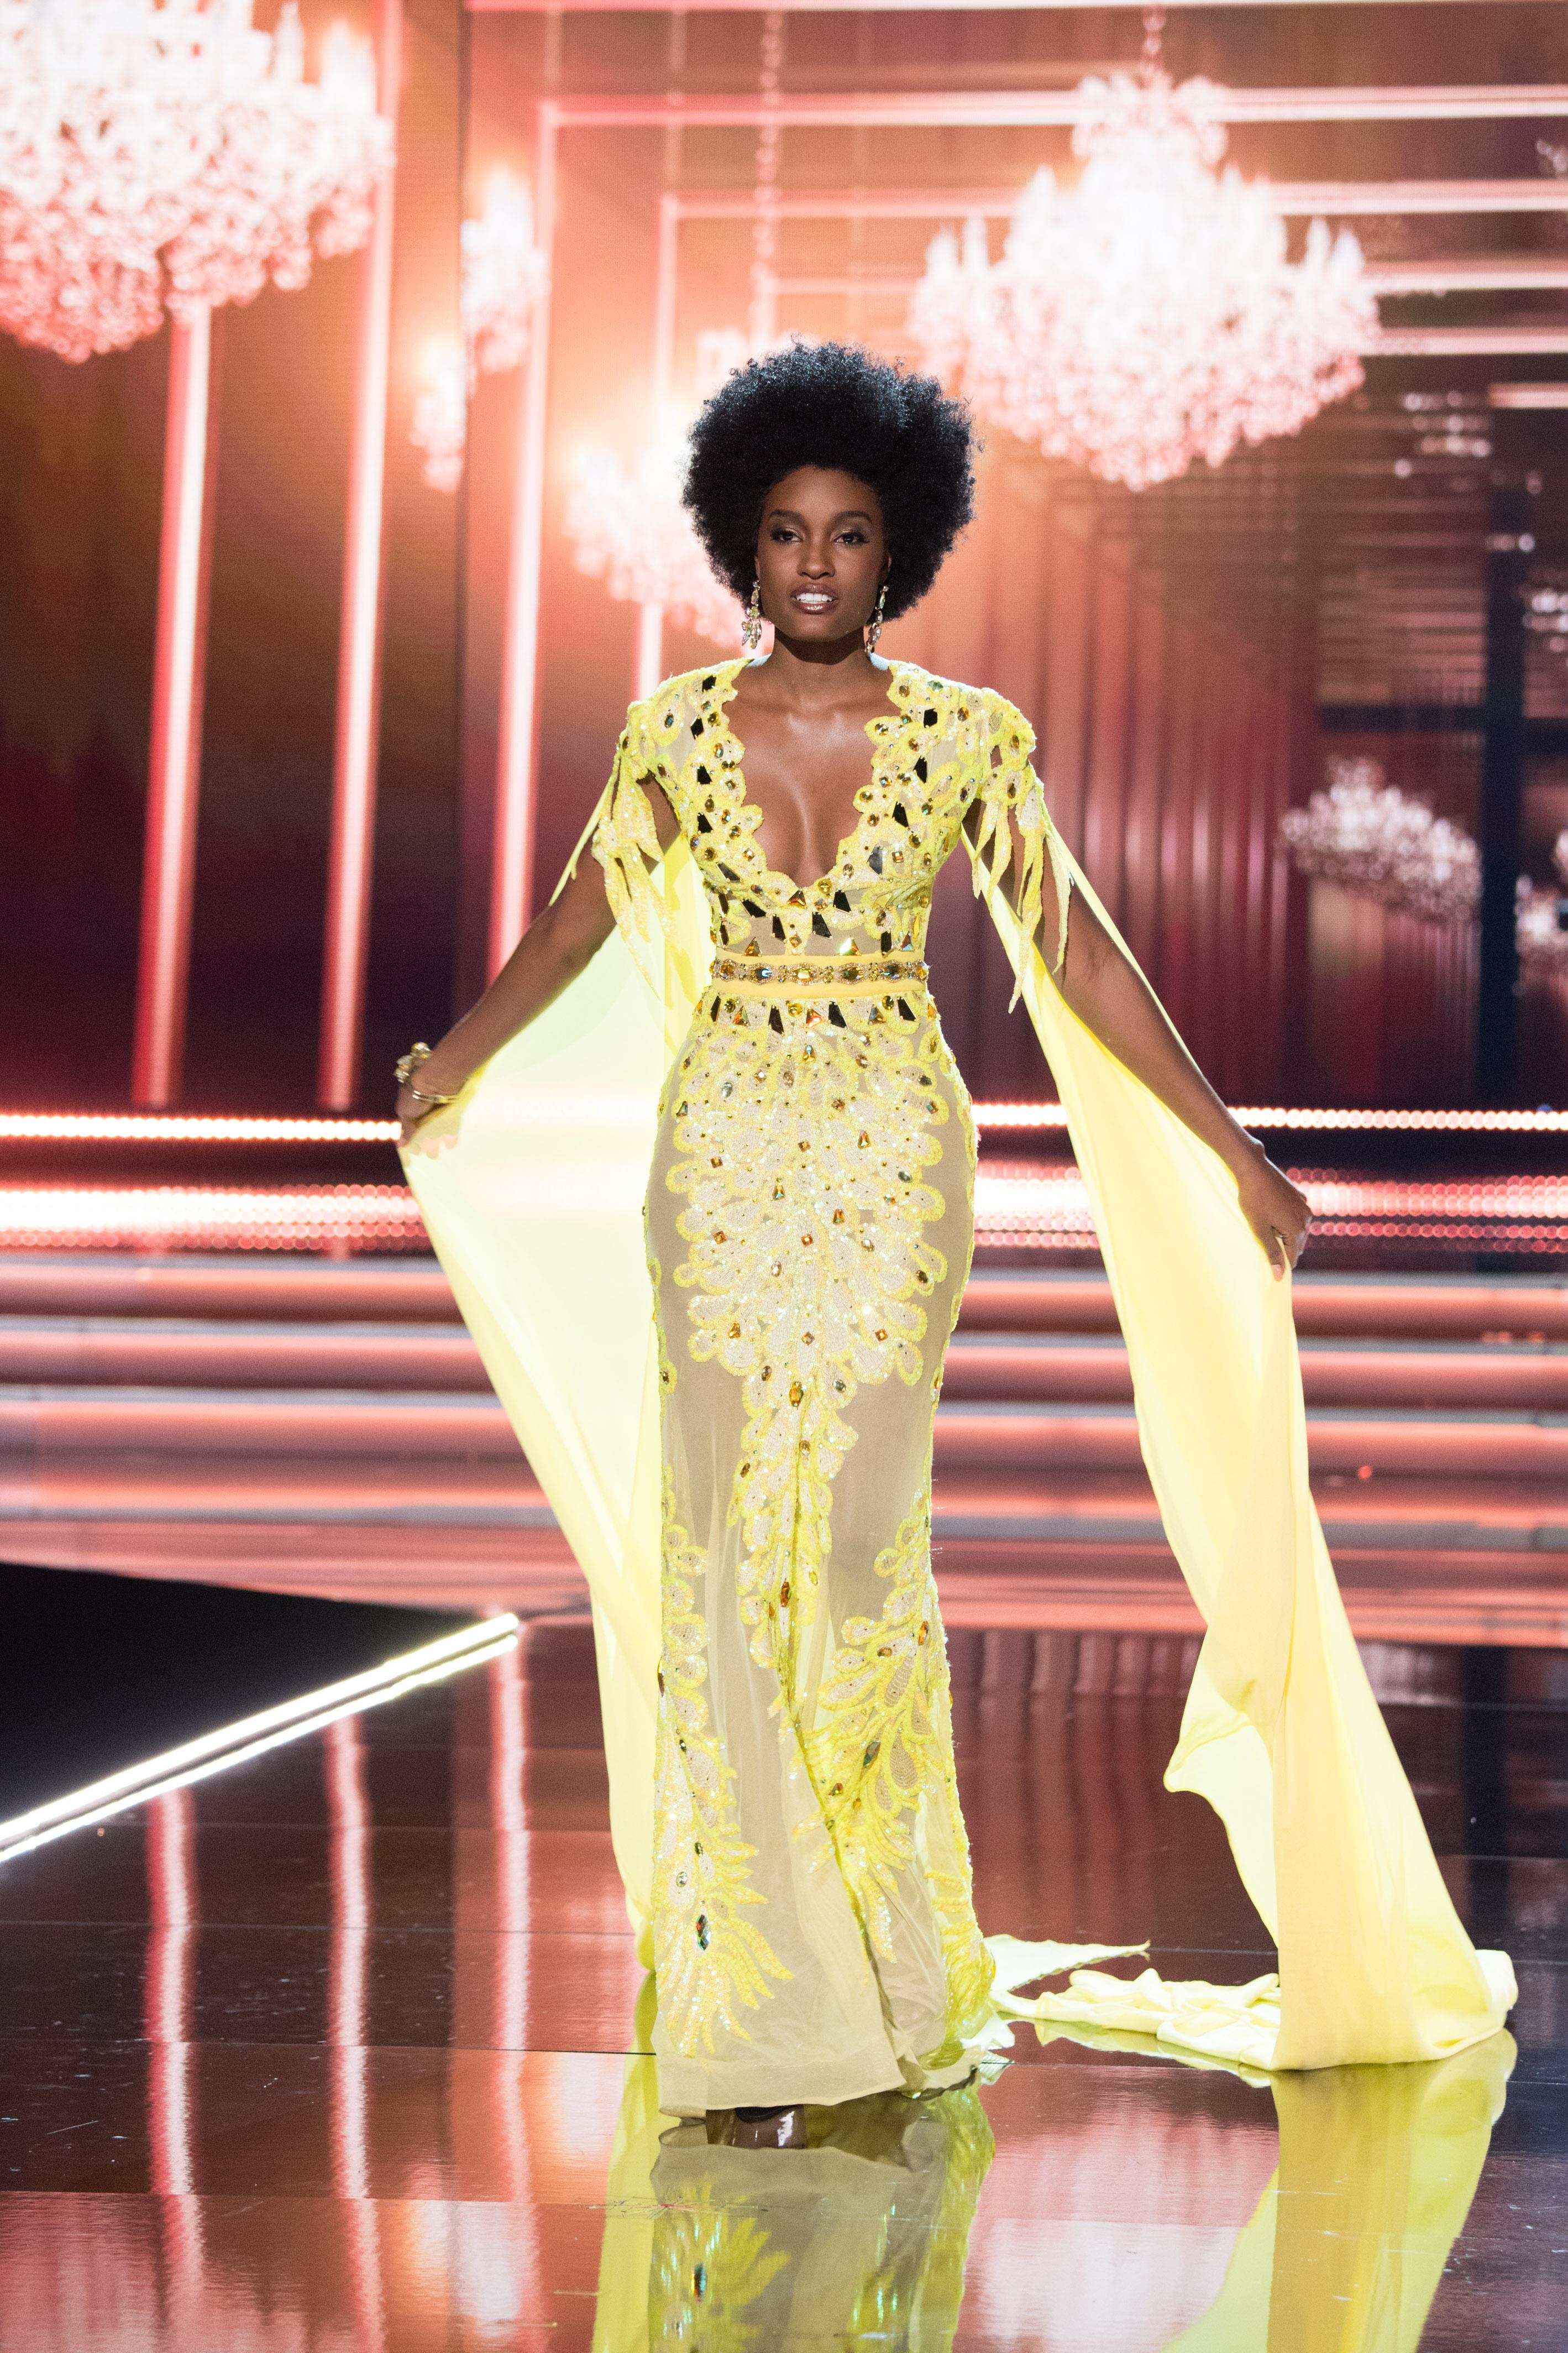 Miss Jamaica Davina Bennett. Photo from the Miss Universe Organization